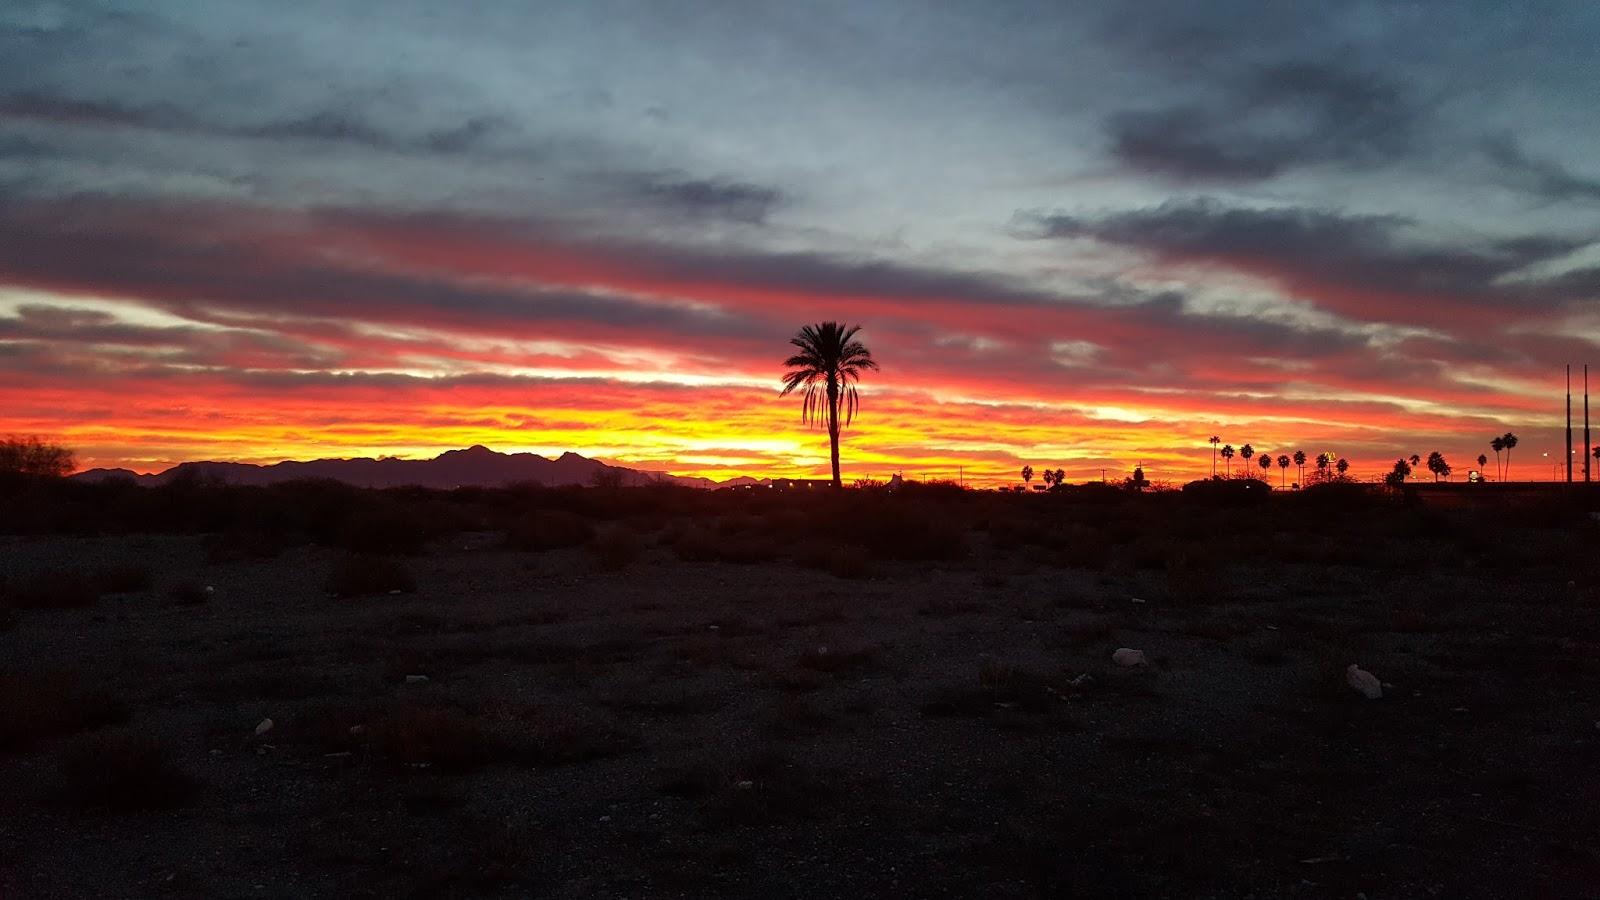 image Good morning from arizona